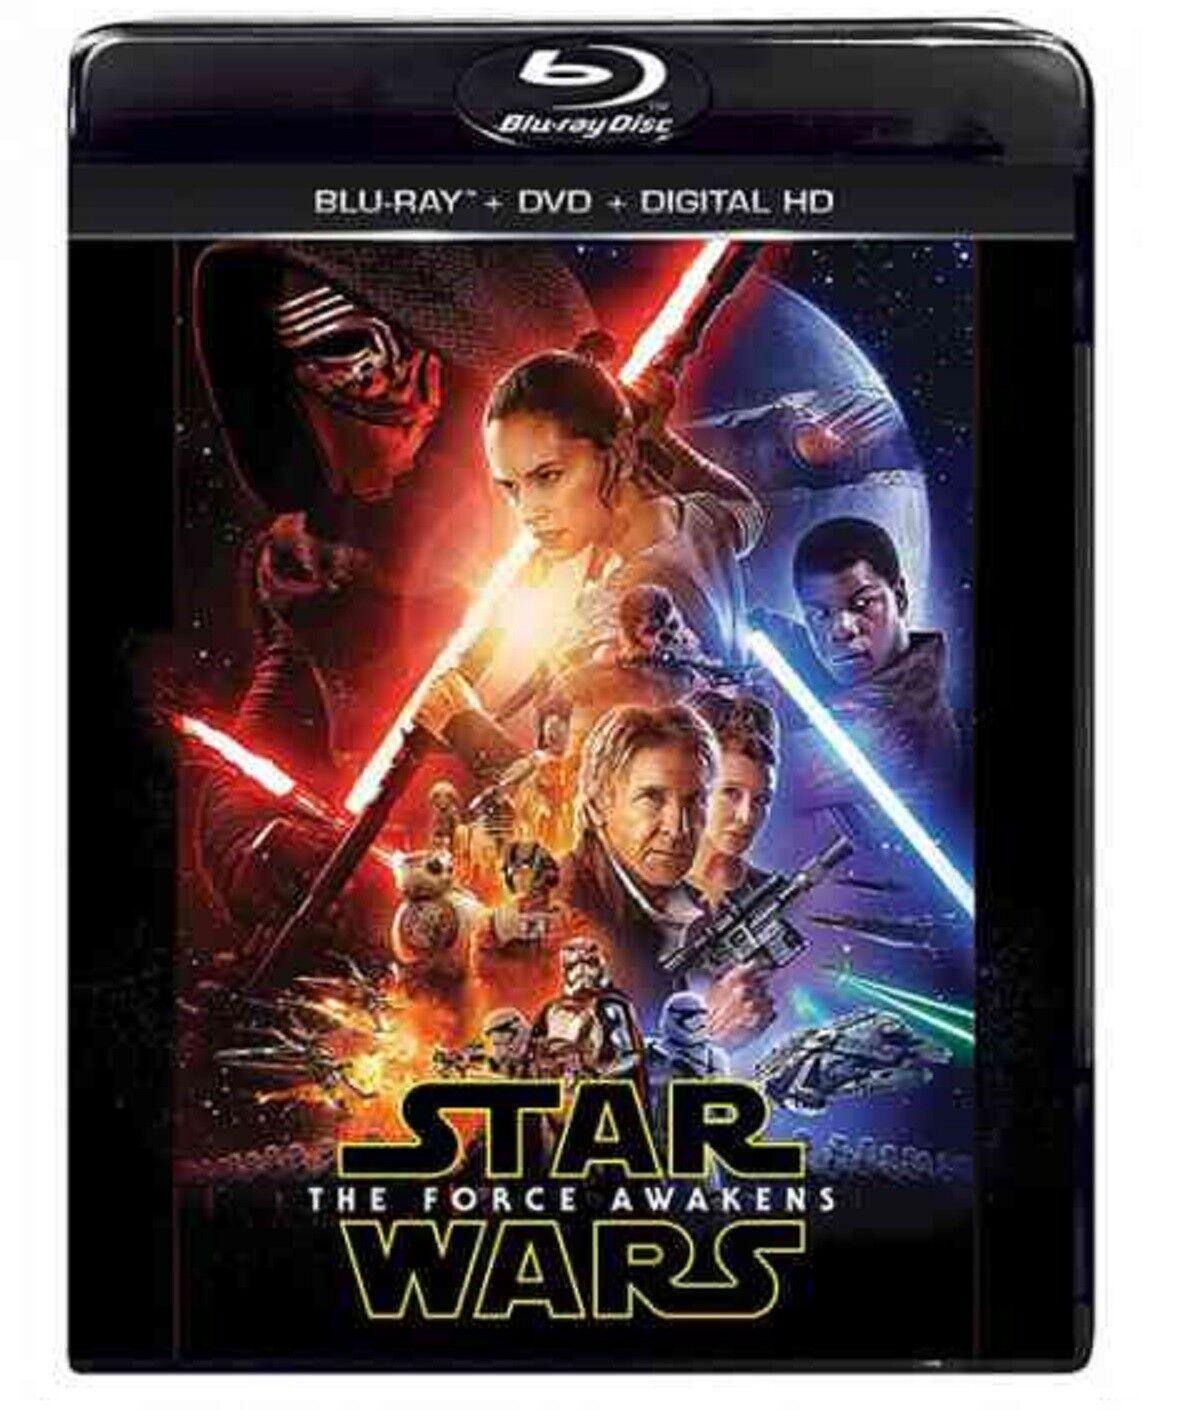 Star Wars: The Force Awakens Blu-ray/DVD, 2016, Includes Digital Copy